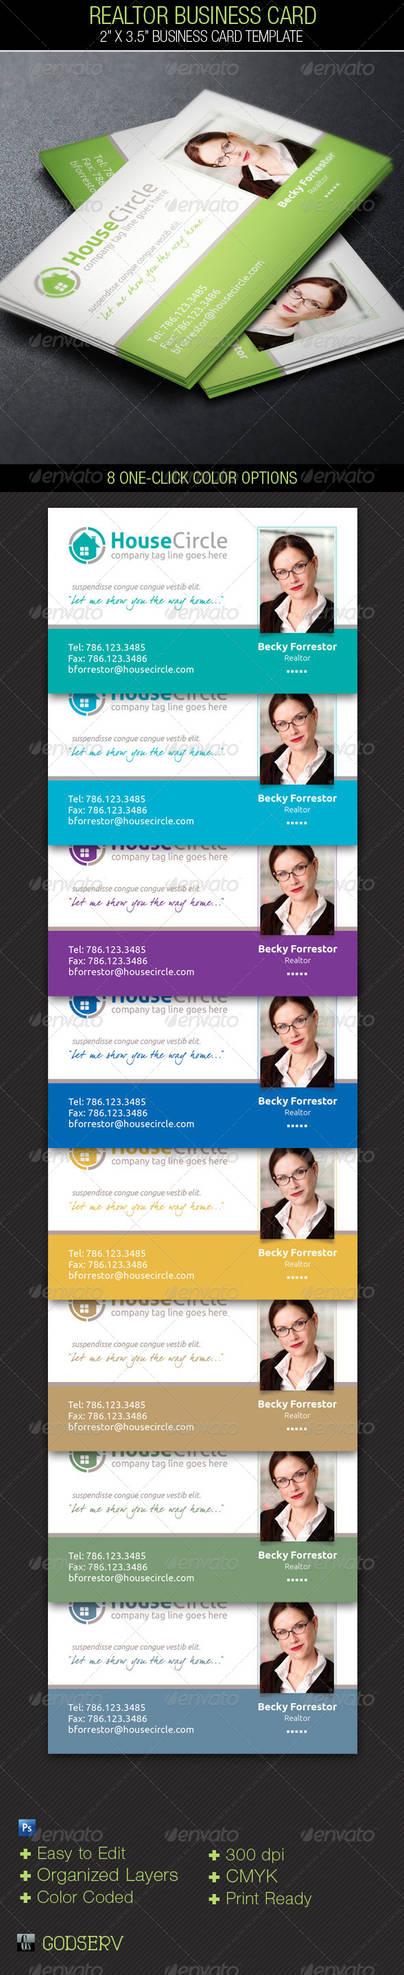 Realtor Business Card Template by Godserv